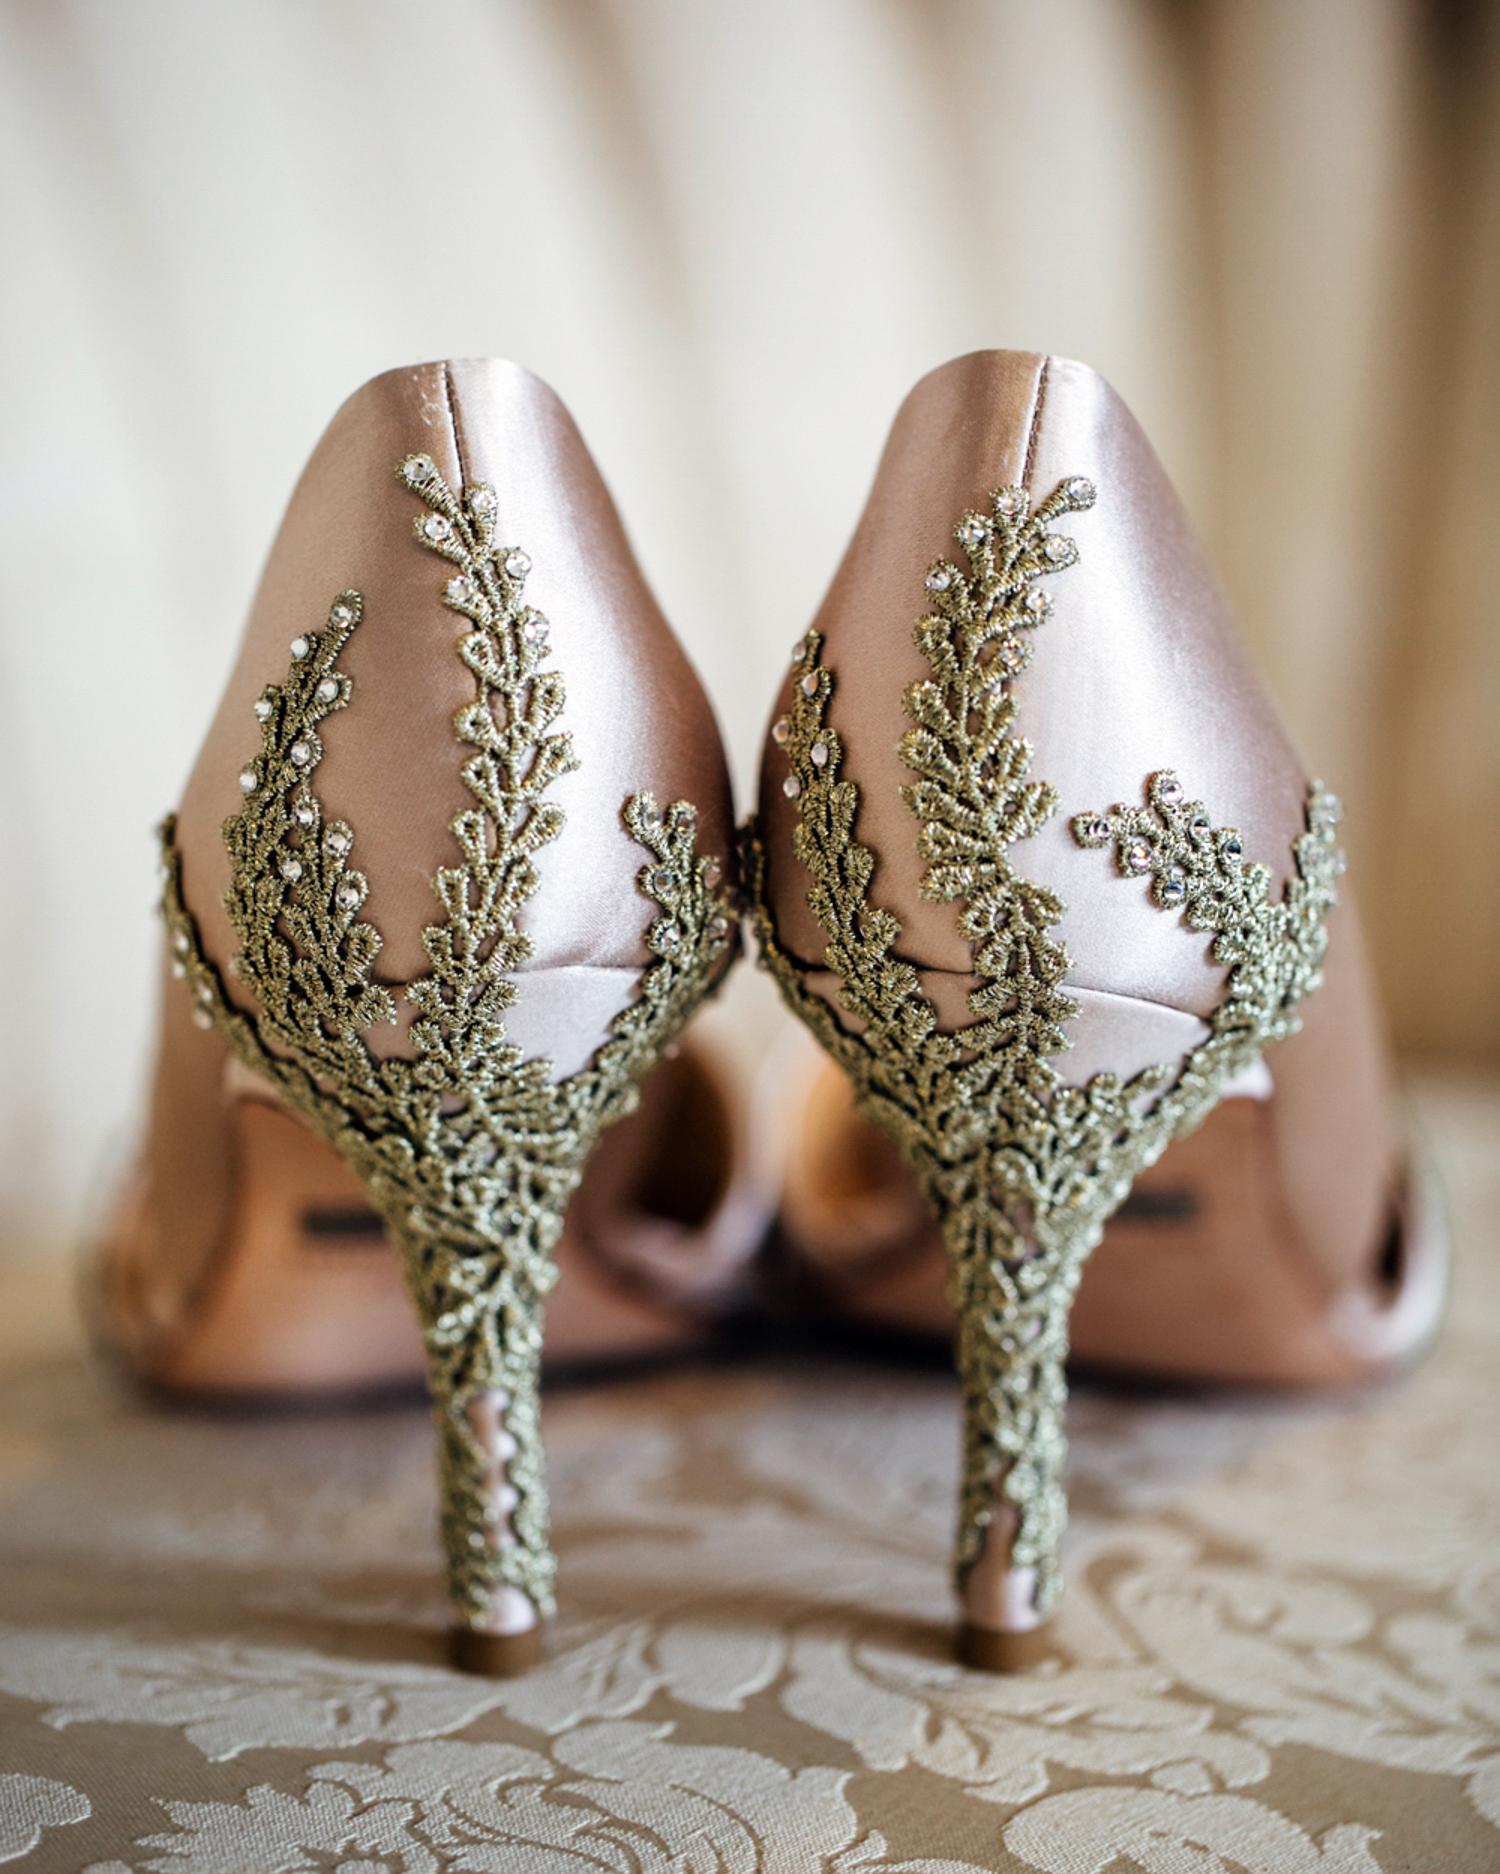 thea-rachit-wedding-shoes-0022-s112016-0715.jpg